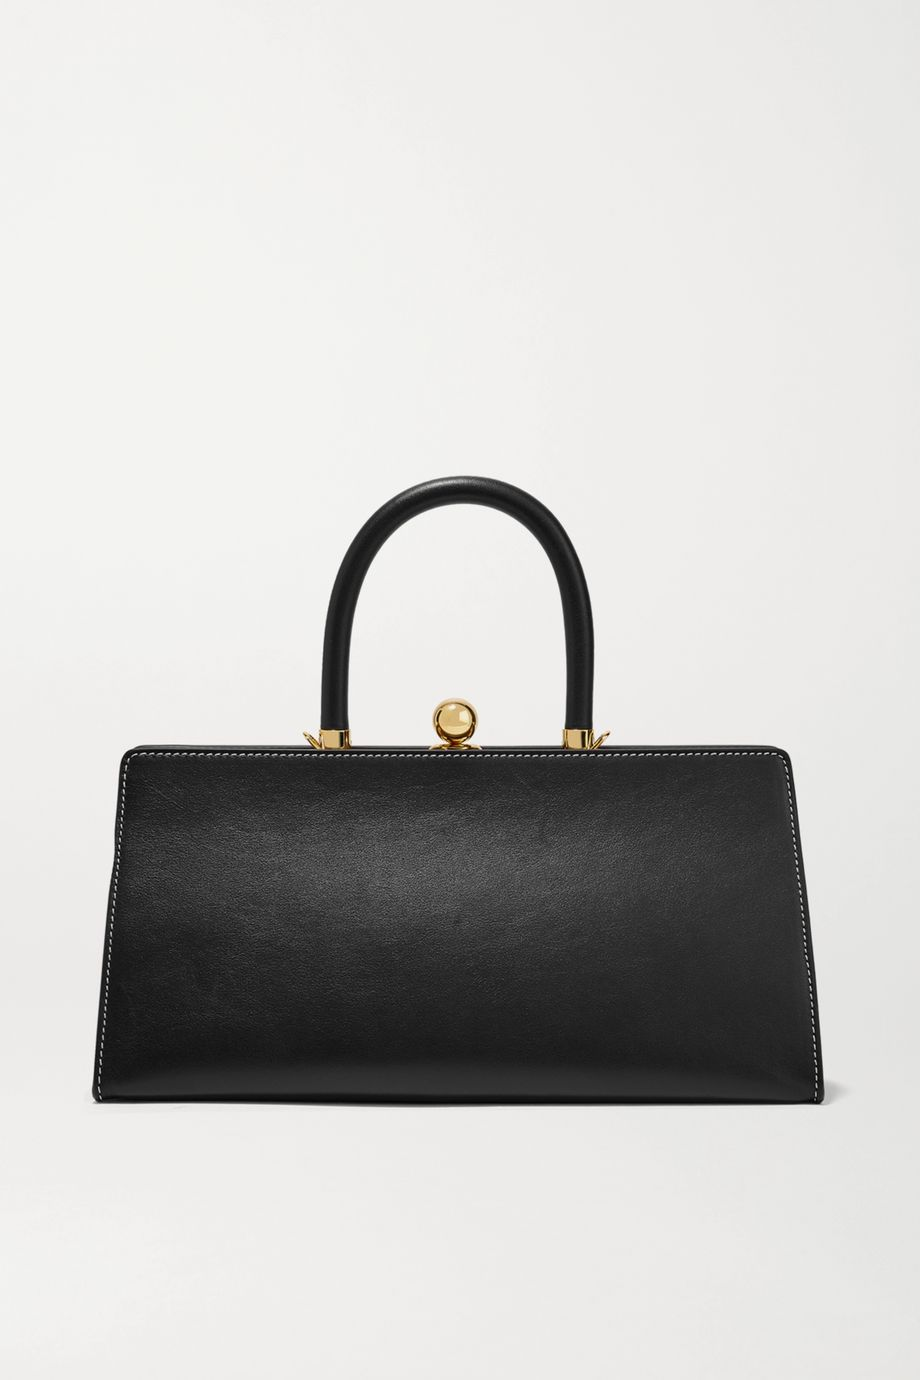 Ratio et Motus Sister leather tote